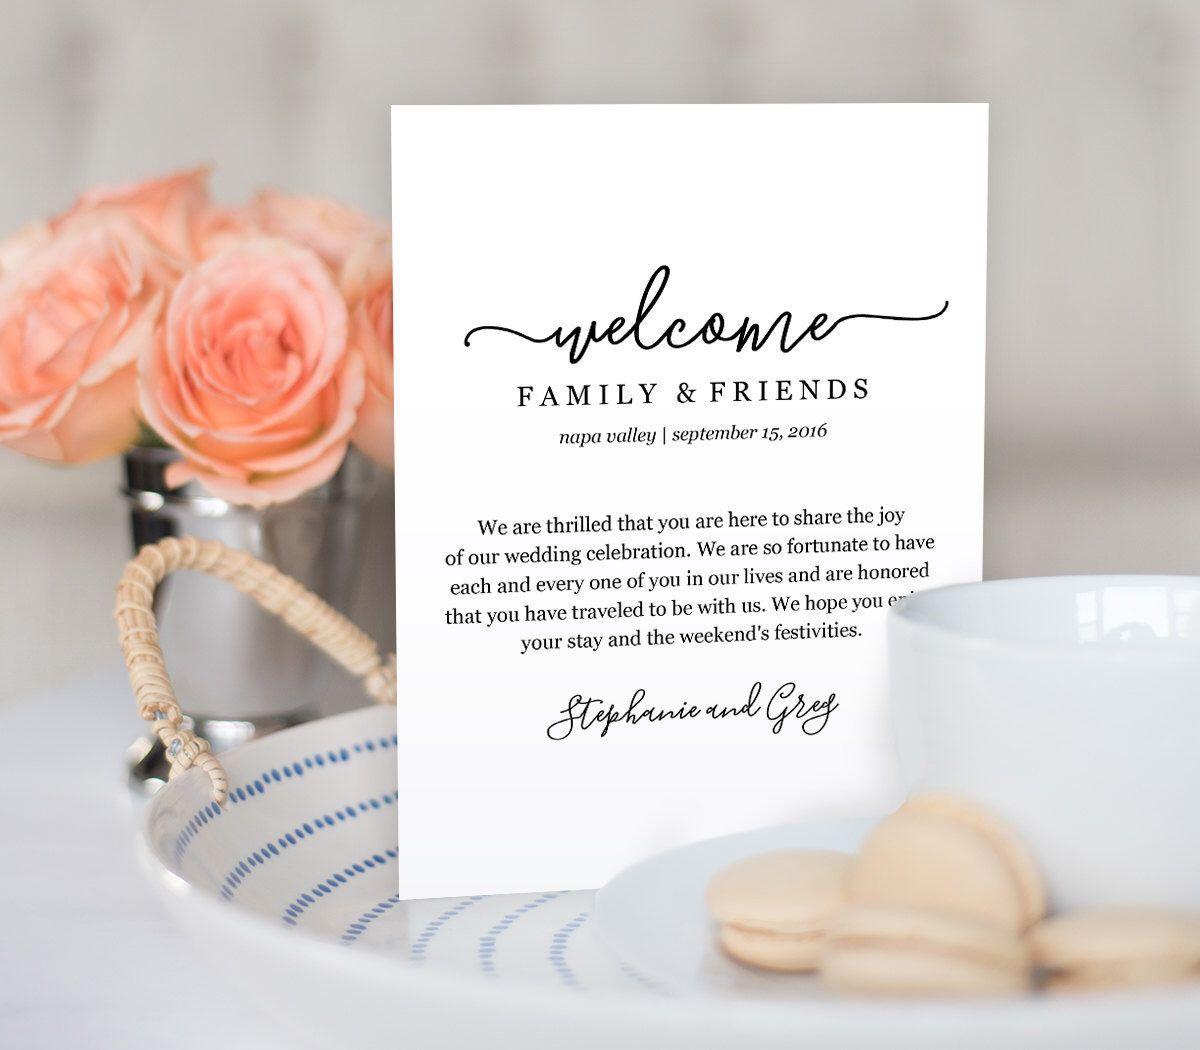 000 Sensational Wedding Welcome Bag Letter Template Idea  FreeFull